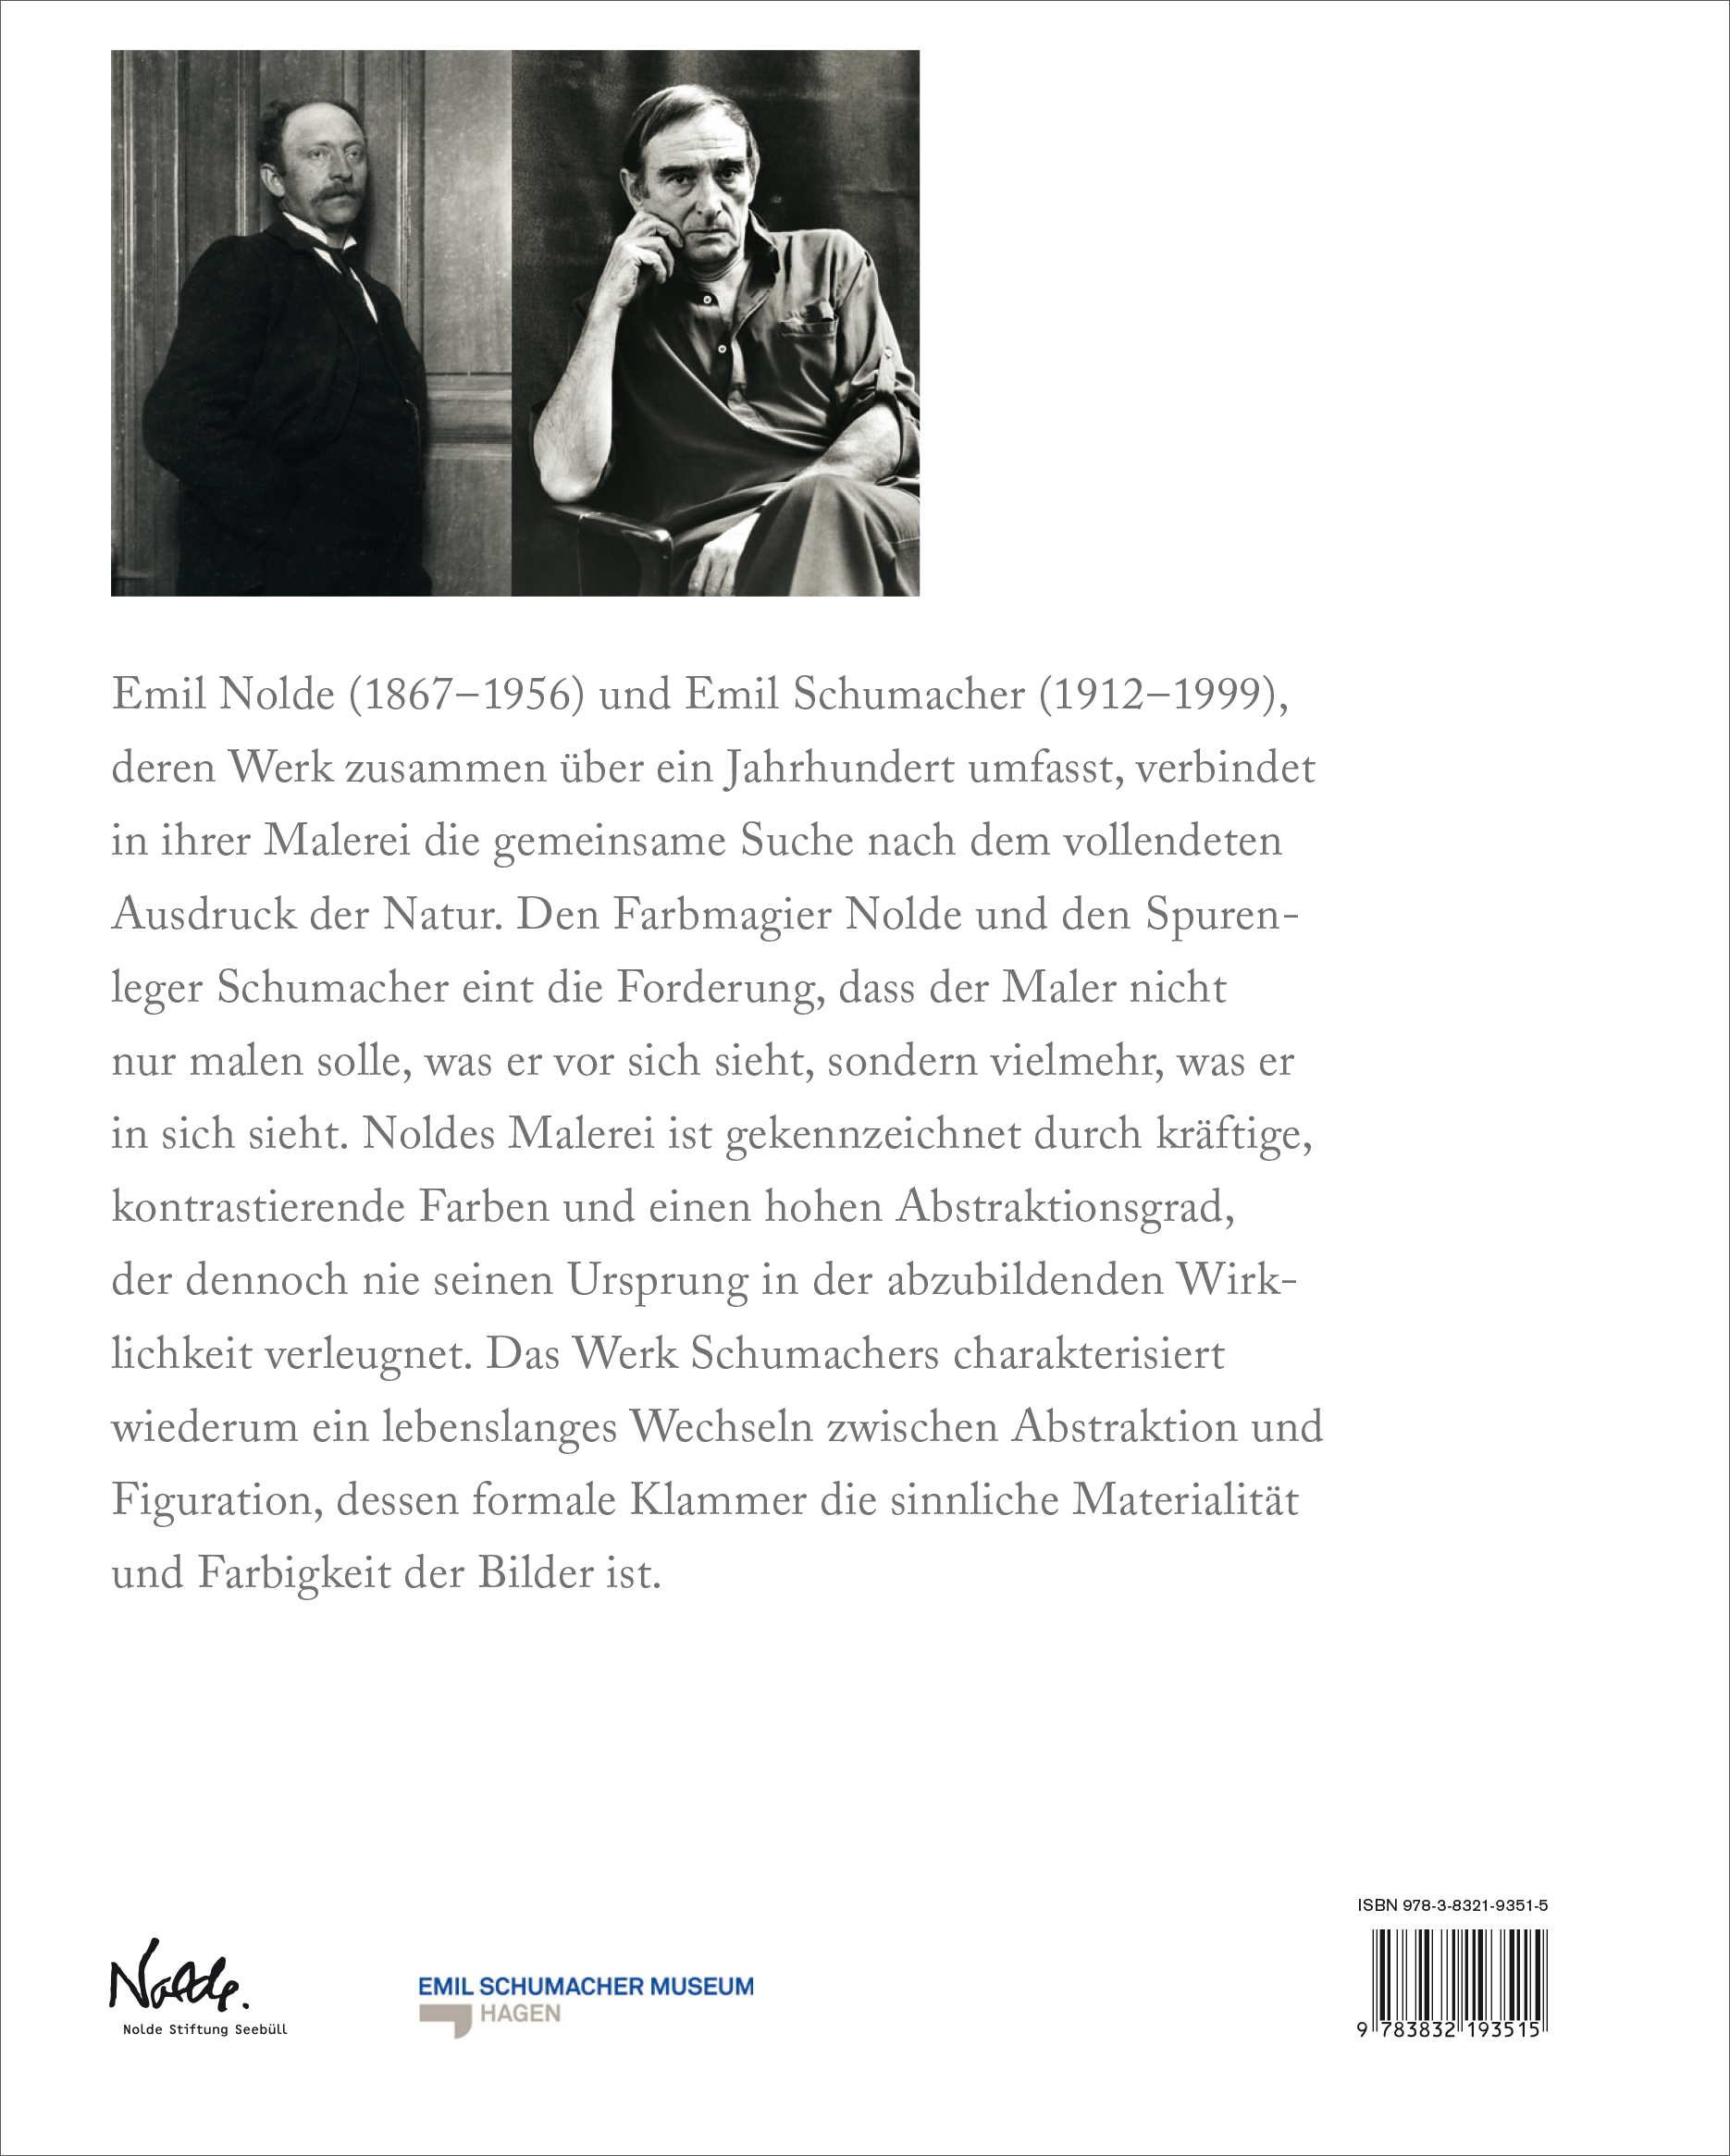 Emil Nolde/ Emil Schumacher. Verwandte Seelen. Kindred Spirits